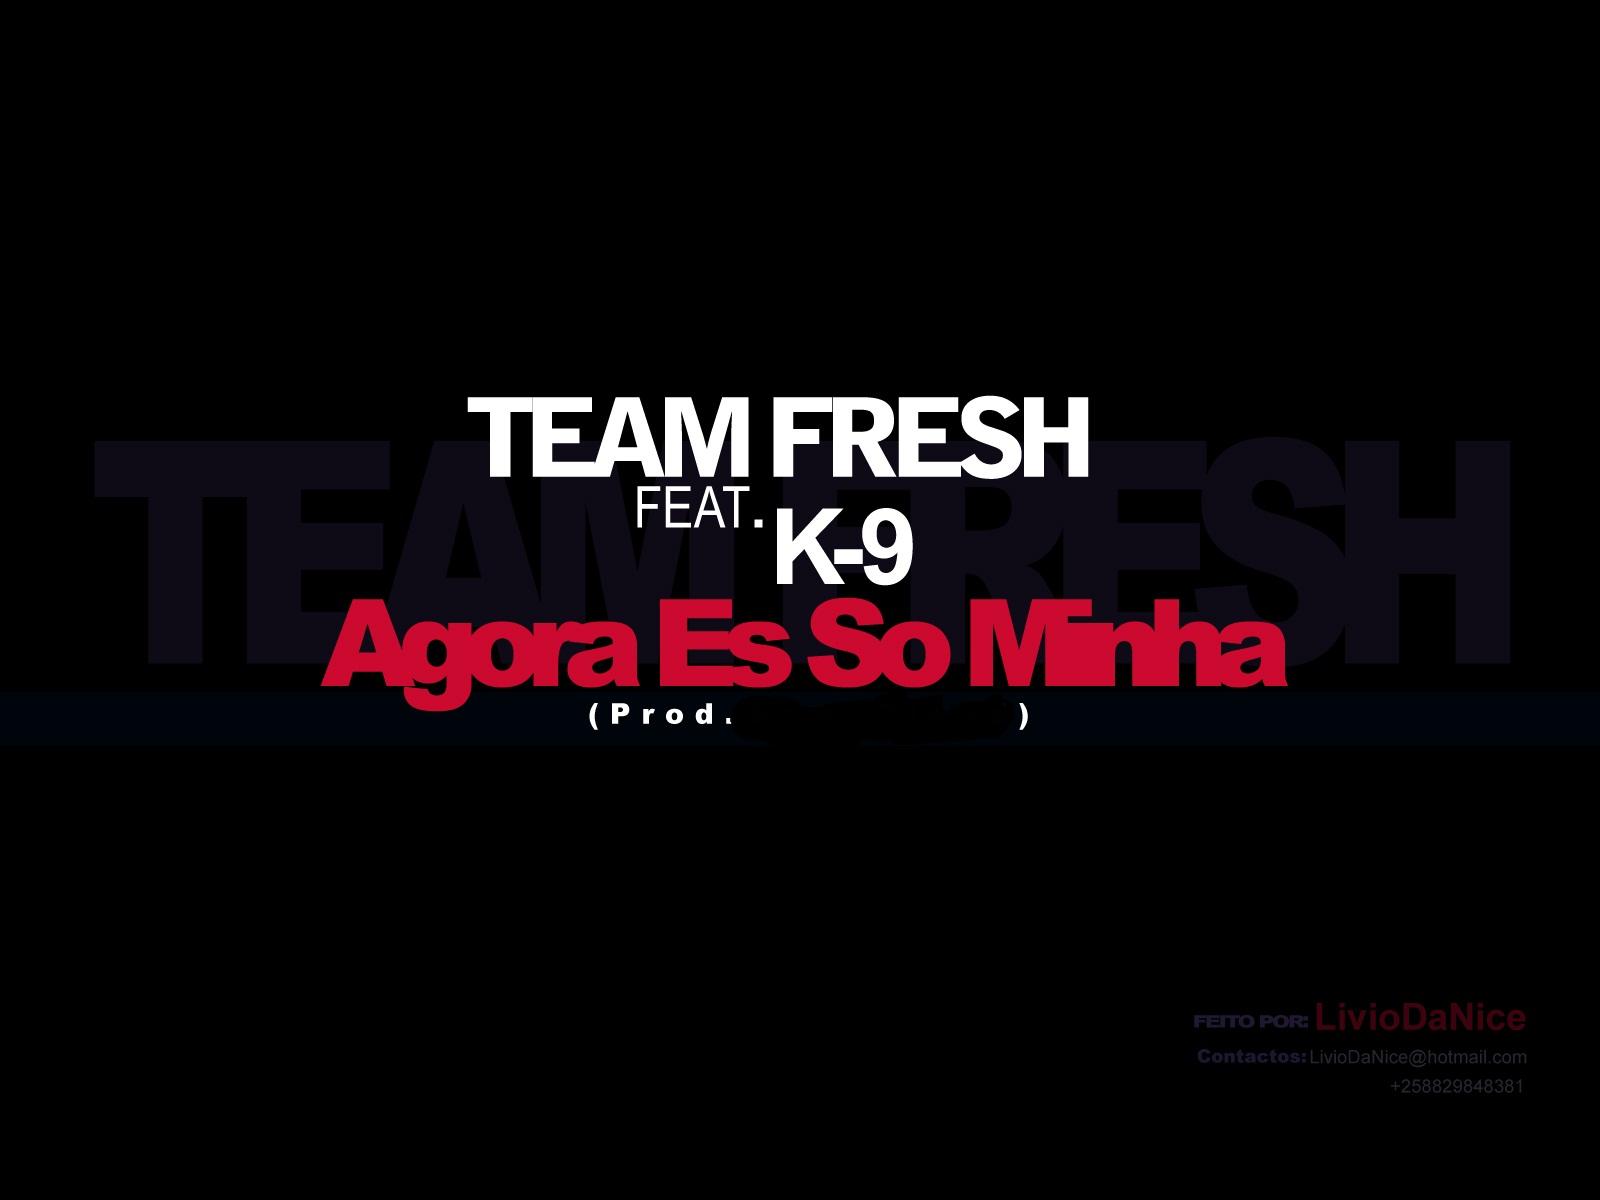 http://2.bp.blogspot.com/-CRjB27J-8UU/Td_Ozi0erjI/AAAAAAAAAPw/cqRjGieXKf8/s1600/Team+Fresh+Feat+K-9%25282%2529.jpg